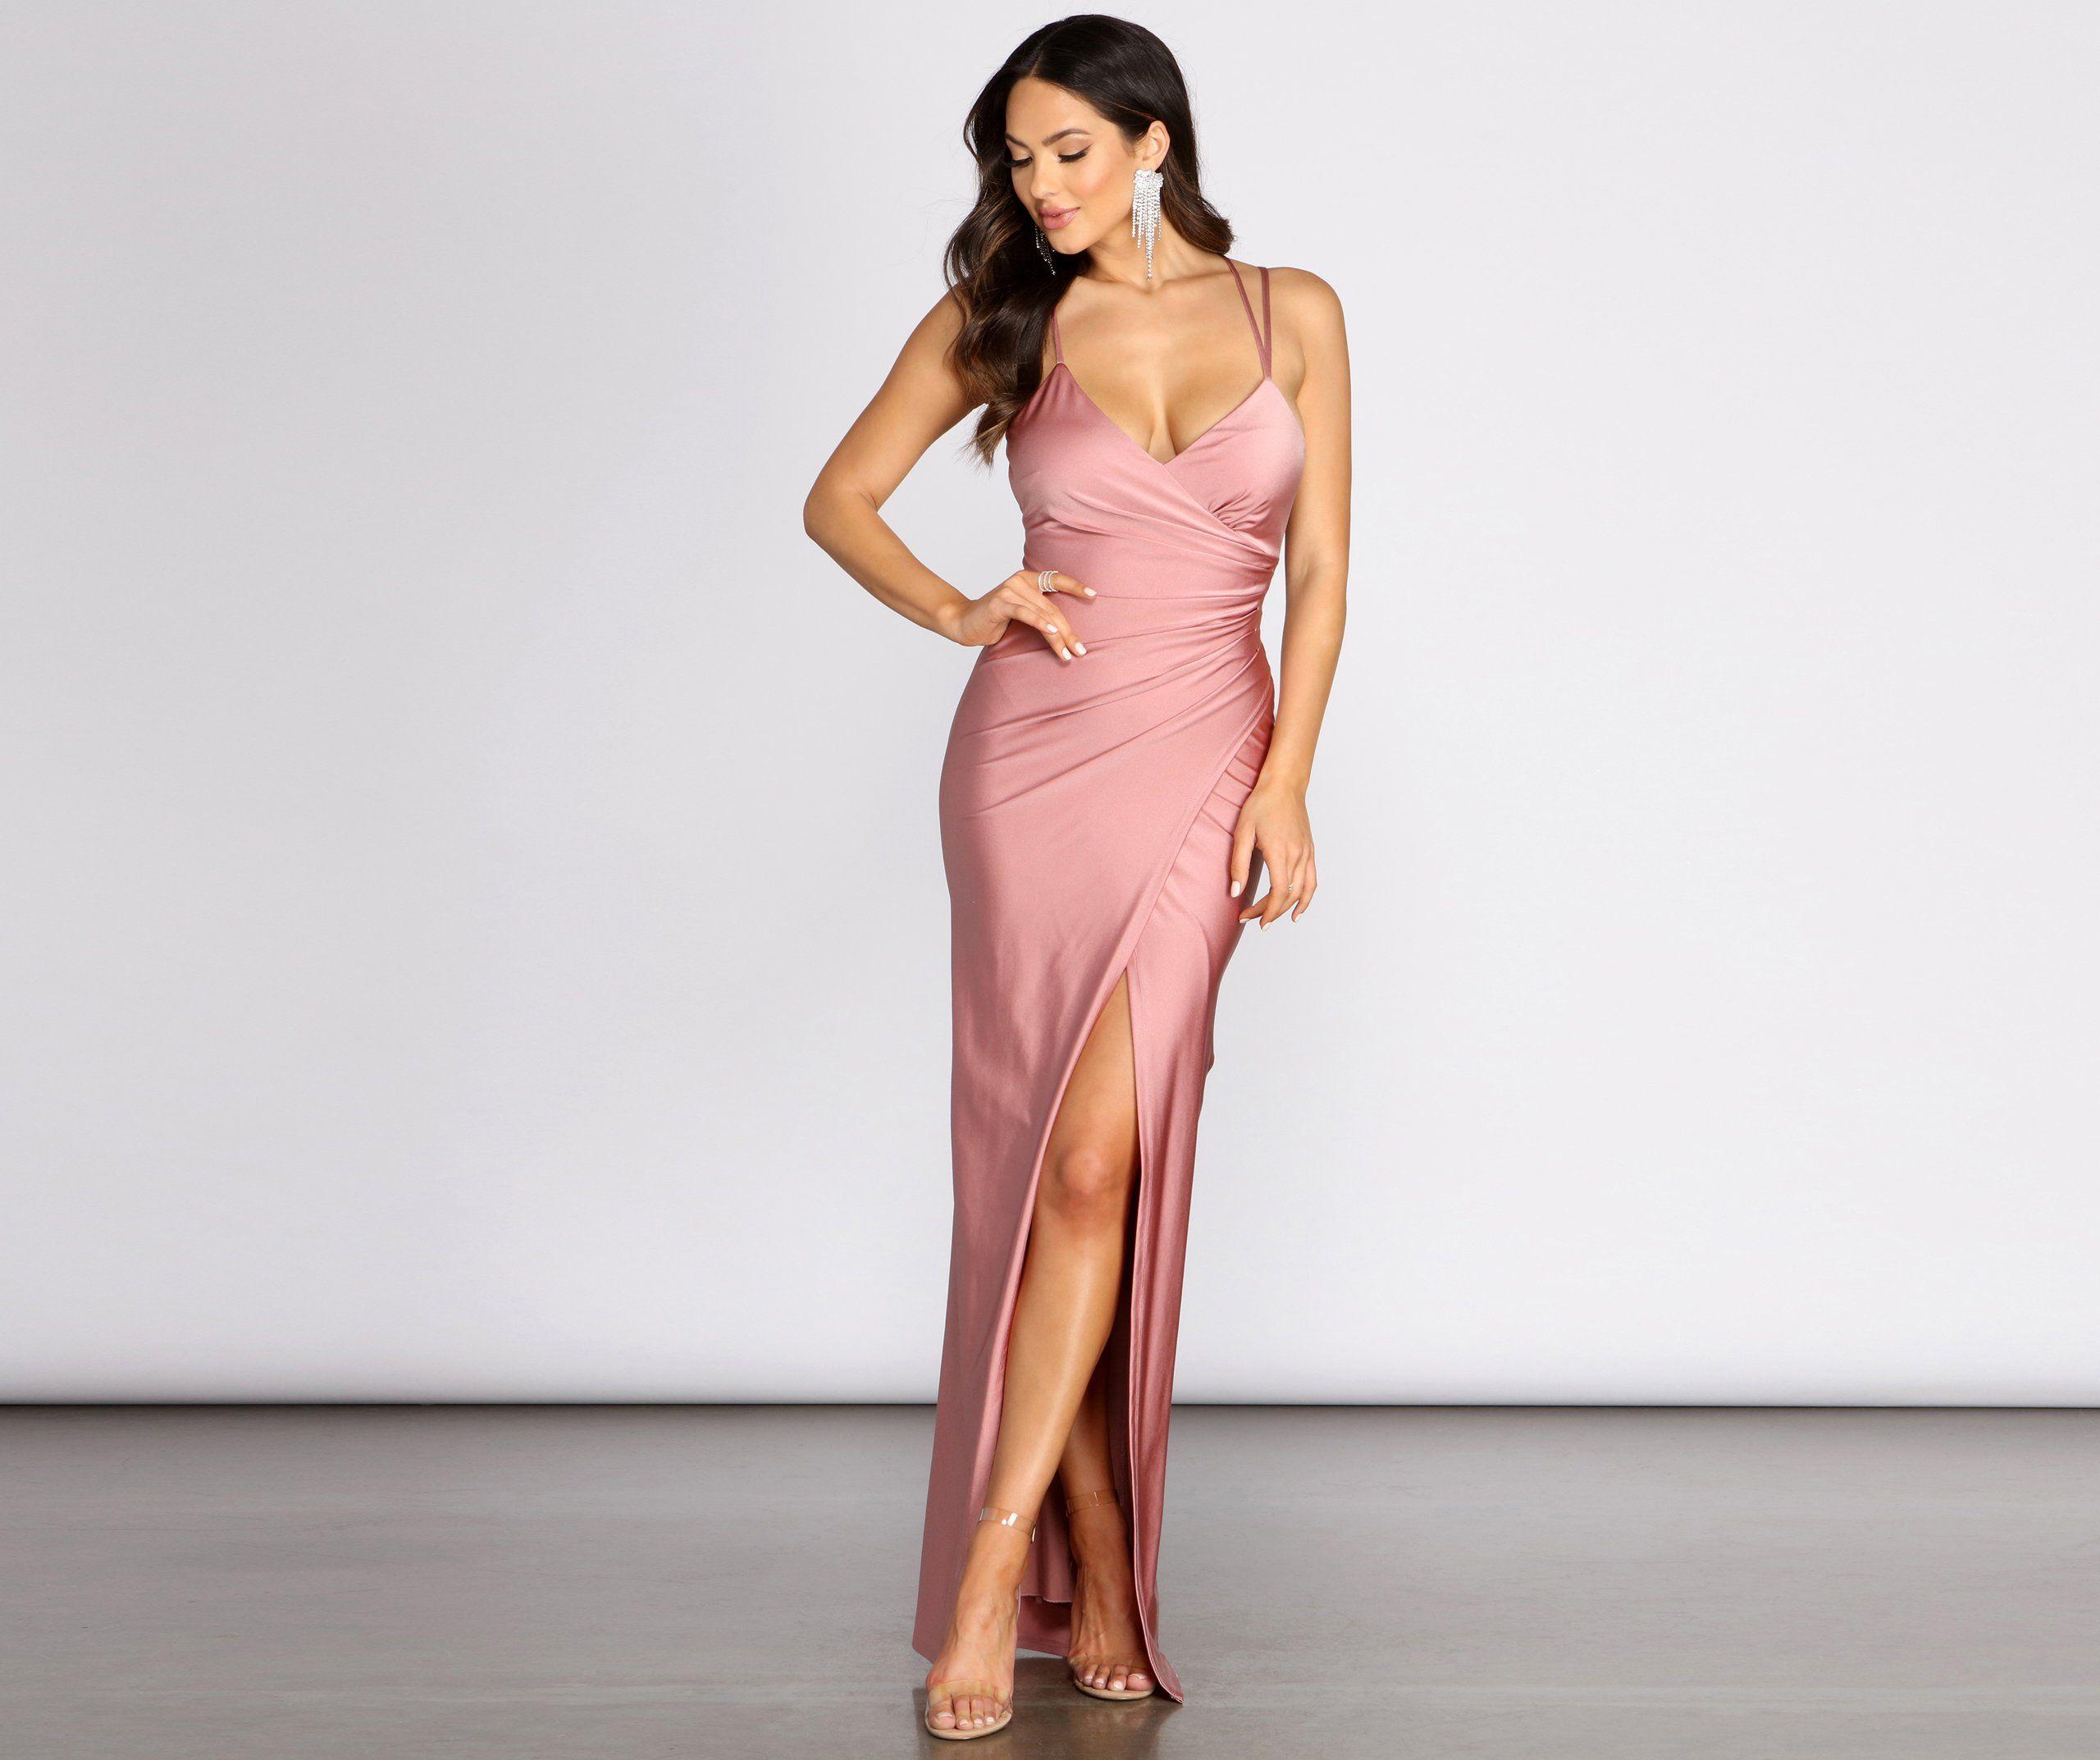 Candra Strappy Back Wrap Dress In 2021 Dresses Unique Dresses Wrap Dress Styles [ 2145 x 2560 Pixel ]